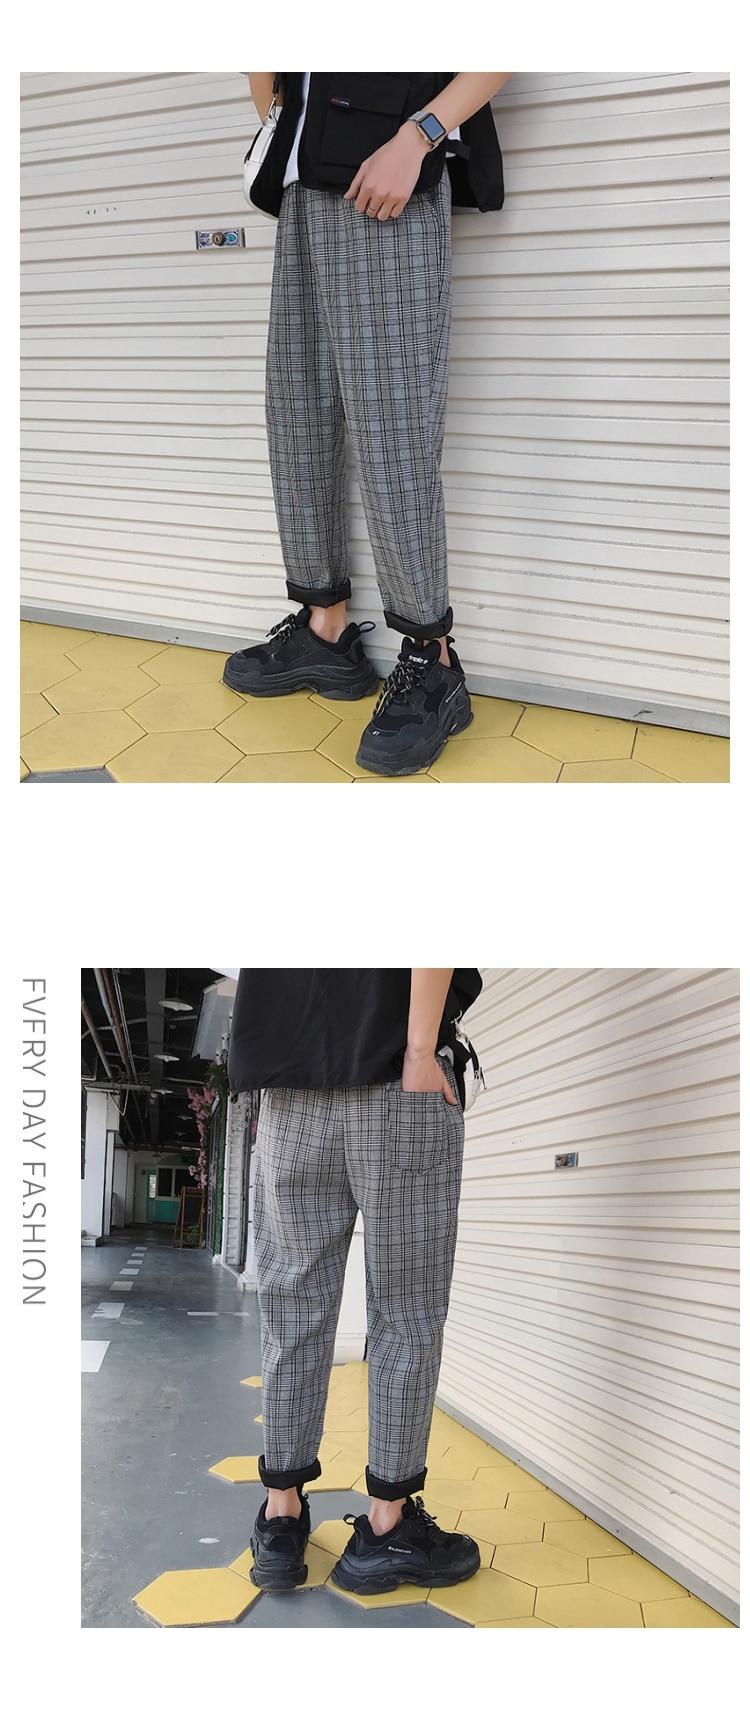 LAPPSTER Streetwear Yellow Plaid Pants Men Joggers 19 Man Casual Straight Harem Pants Men Korean Hip Hop Track Pants Plus Size 21